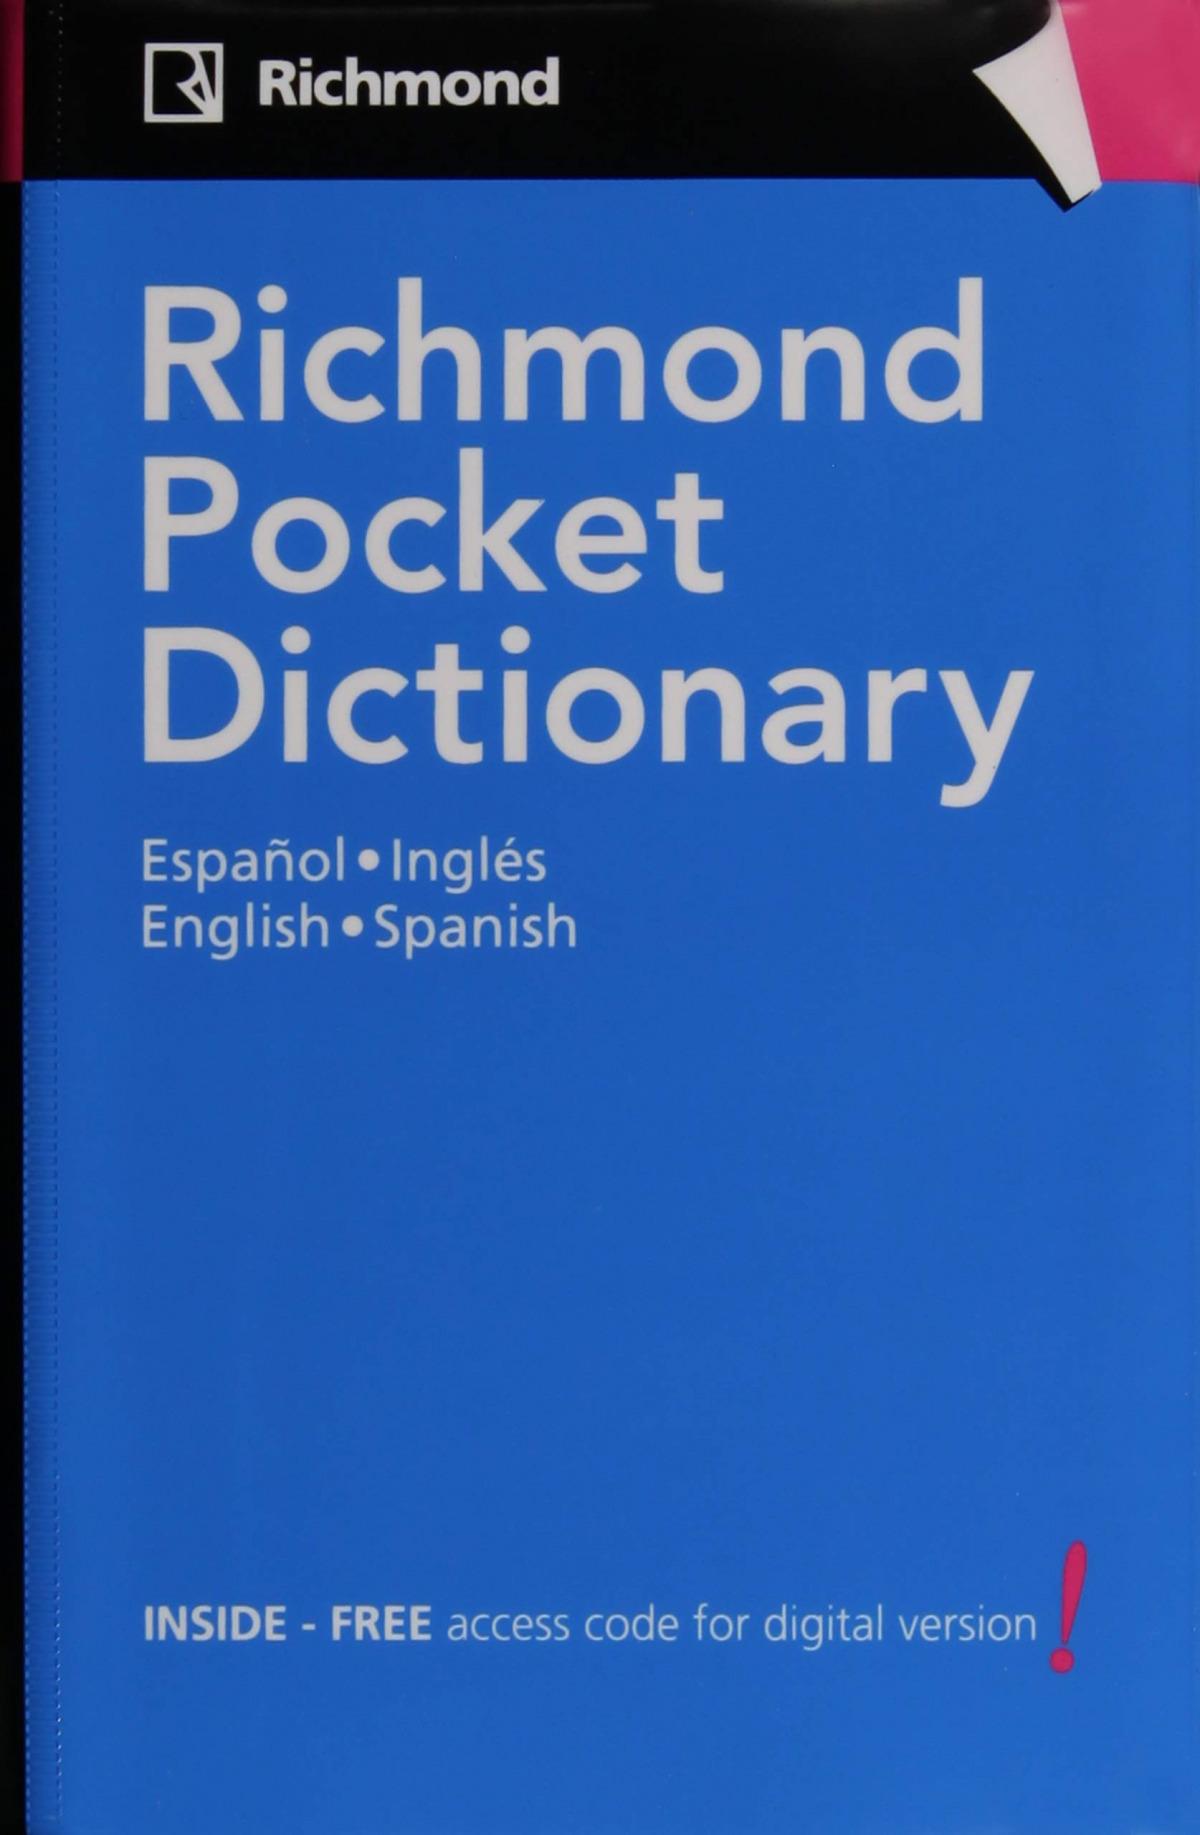 Richmond pocket dictionary español/ingles 9788466814164